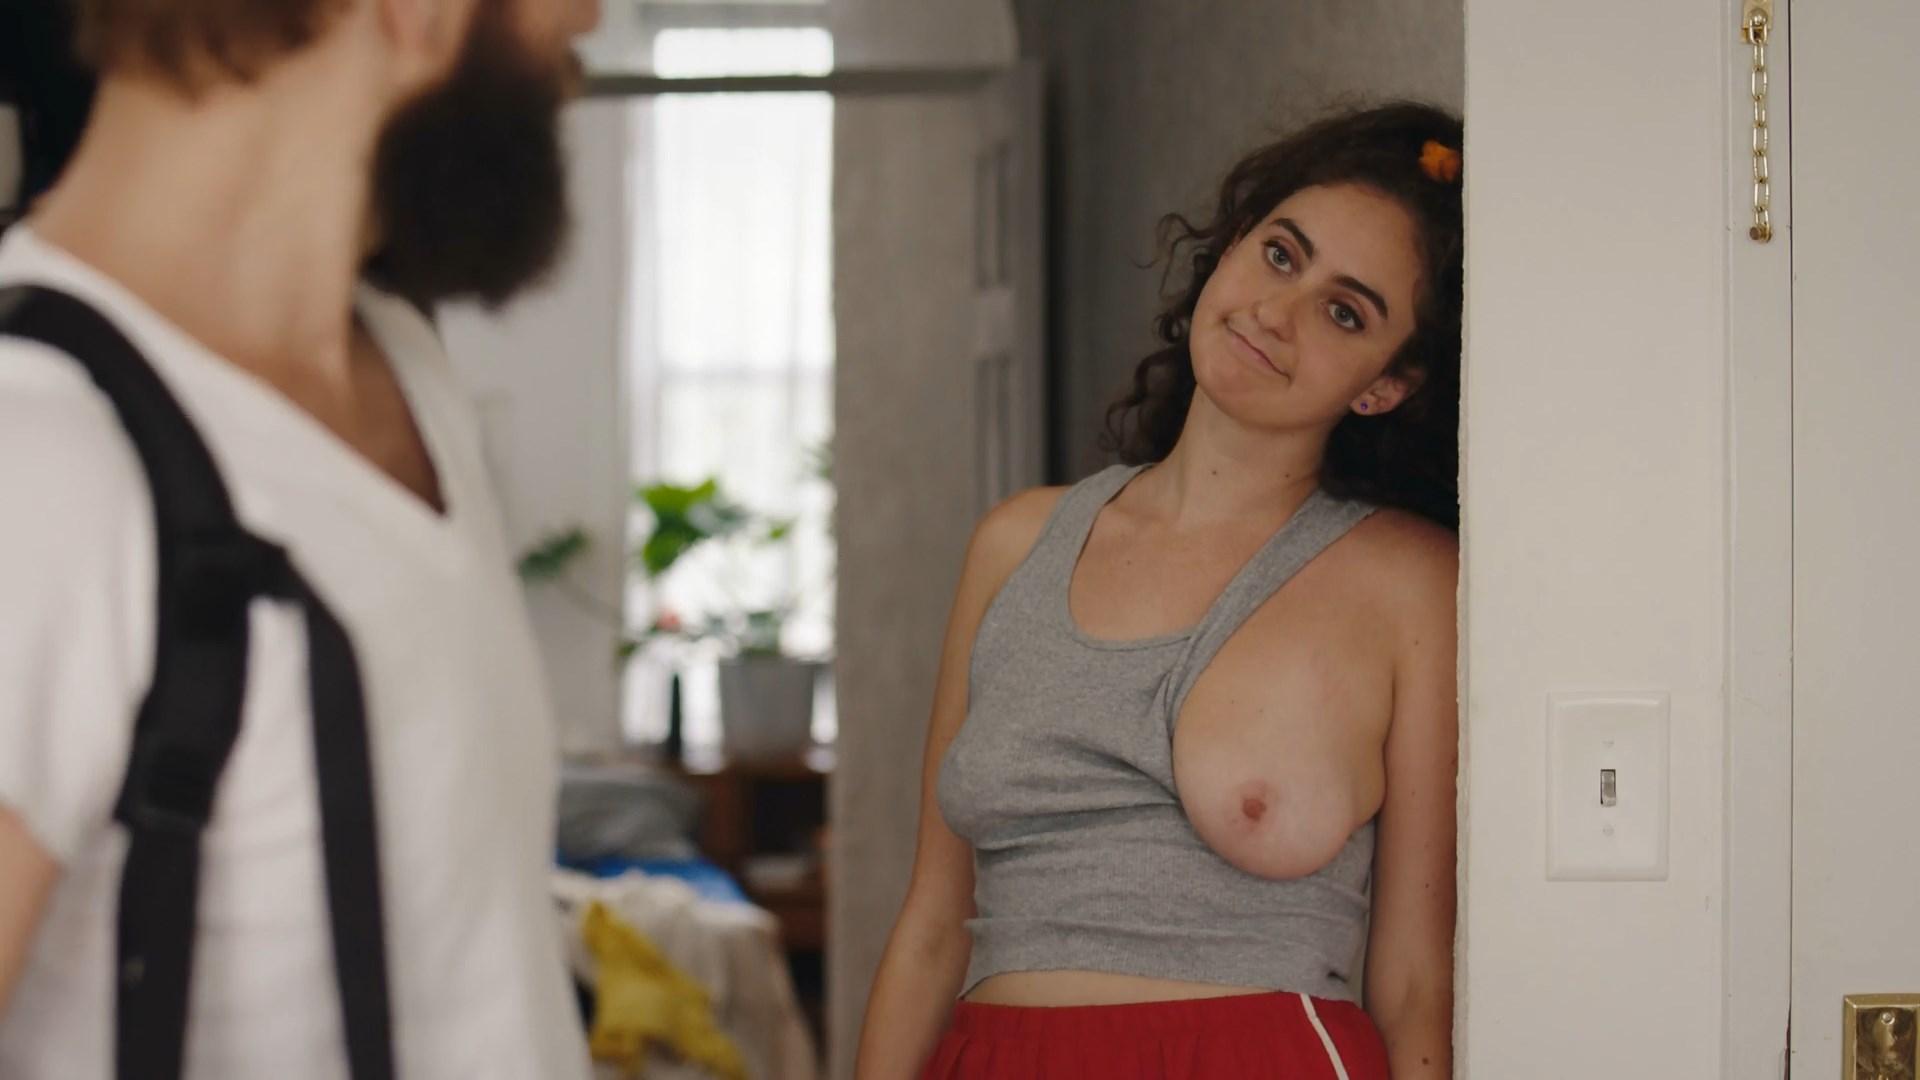 Marta Milans Nackt Marta Milans Nude Photos 2019 2019 05 18